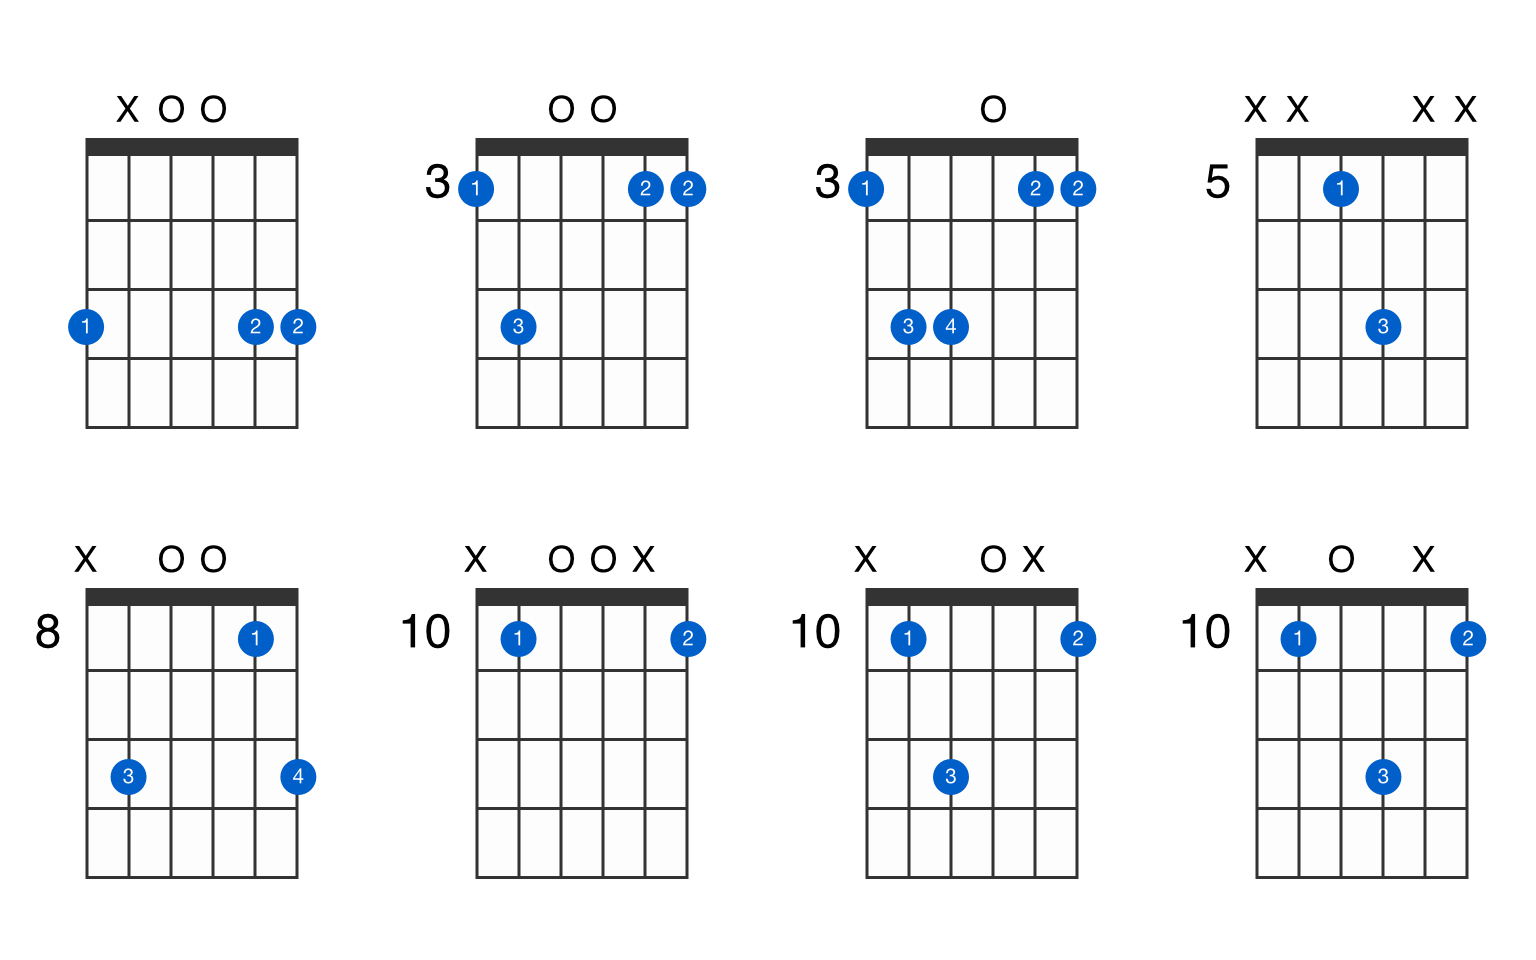 G5 guitar chord - GtrLib Chords